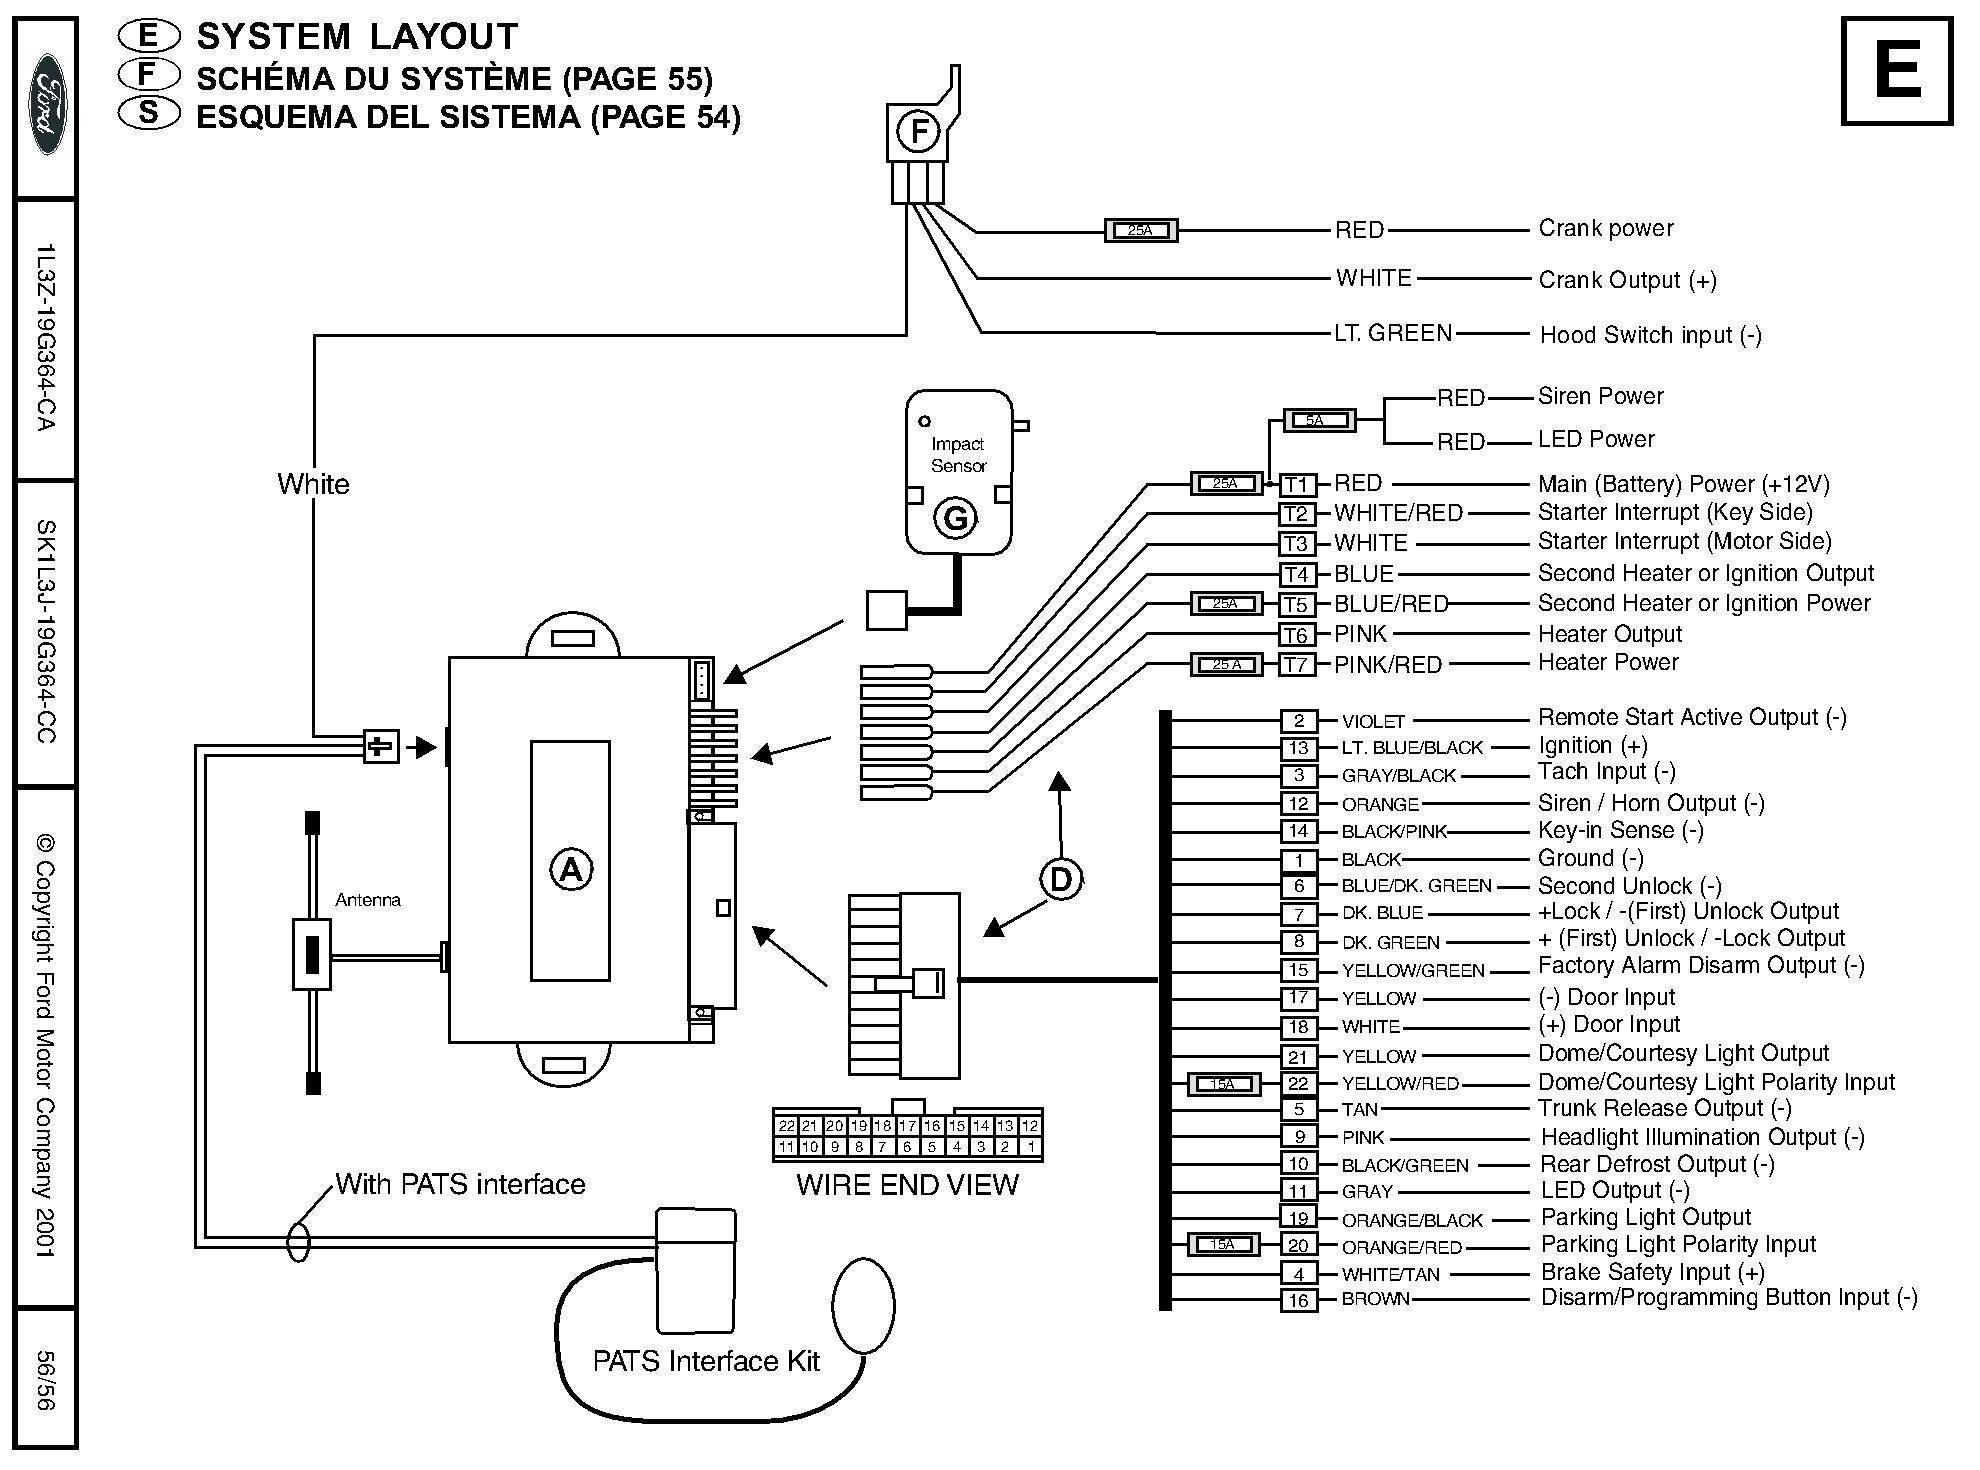 Auto Command Remote Starter Wiring Diagram Beautiful Car Remote Start Wiring Diagram Picture Collection Of Auto Command Remote Starter Wiring Diagram